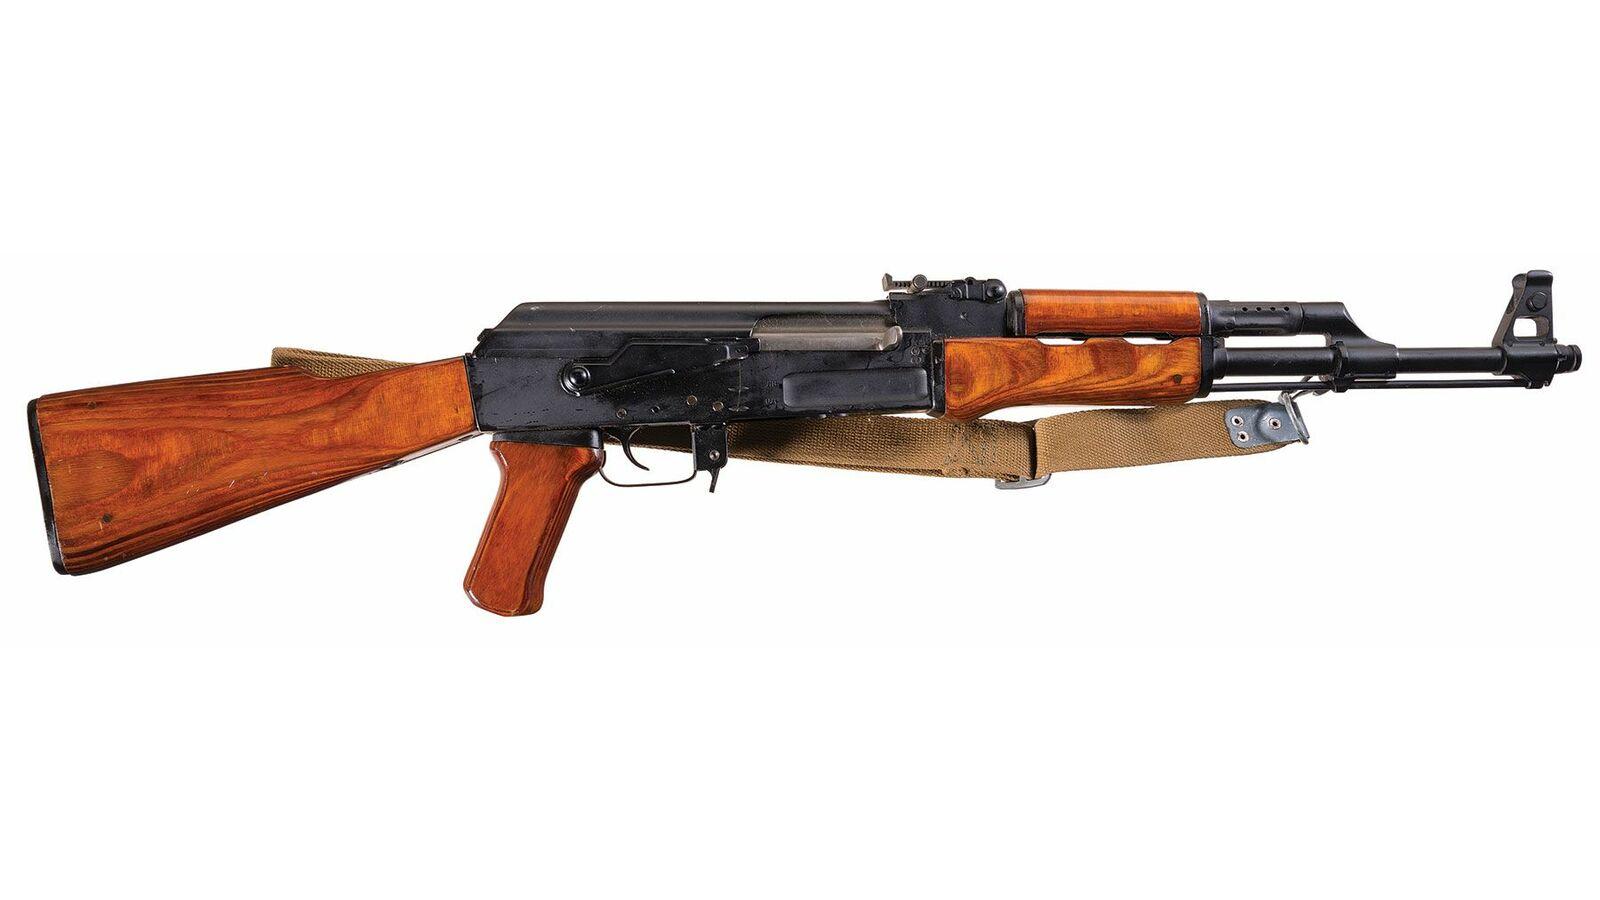 Ak47 Nfa Fully Automatic Assault Rifle Ishevsk